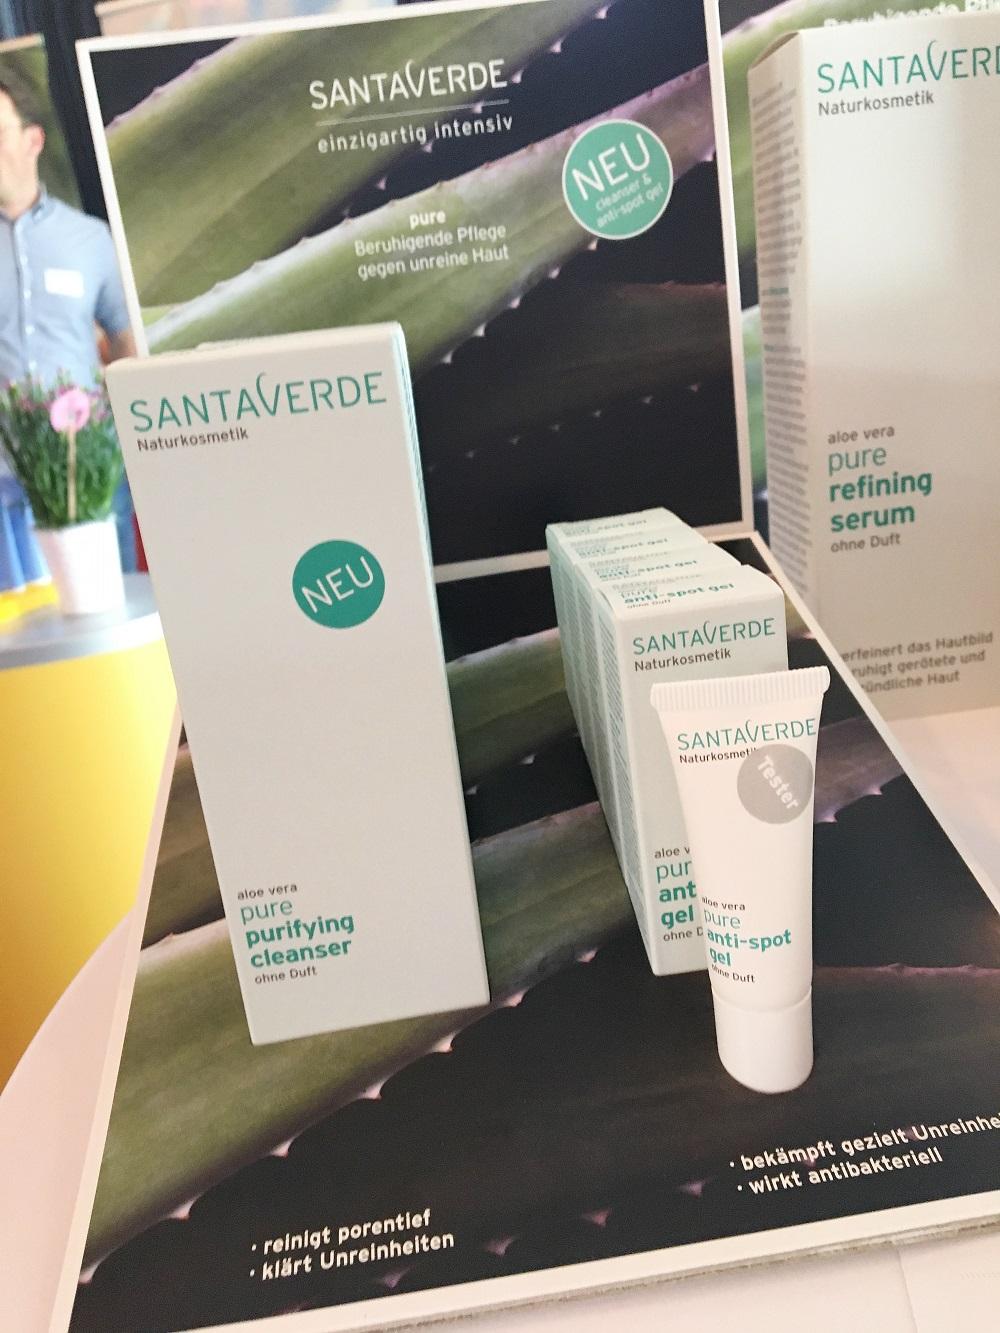 Green Cosmetics Bloggerevent Santaverde Pure Produktserie